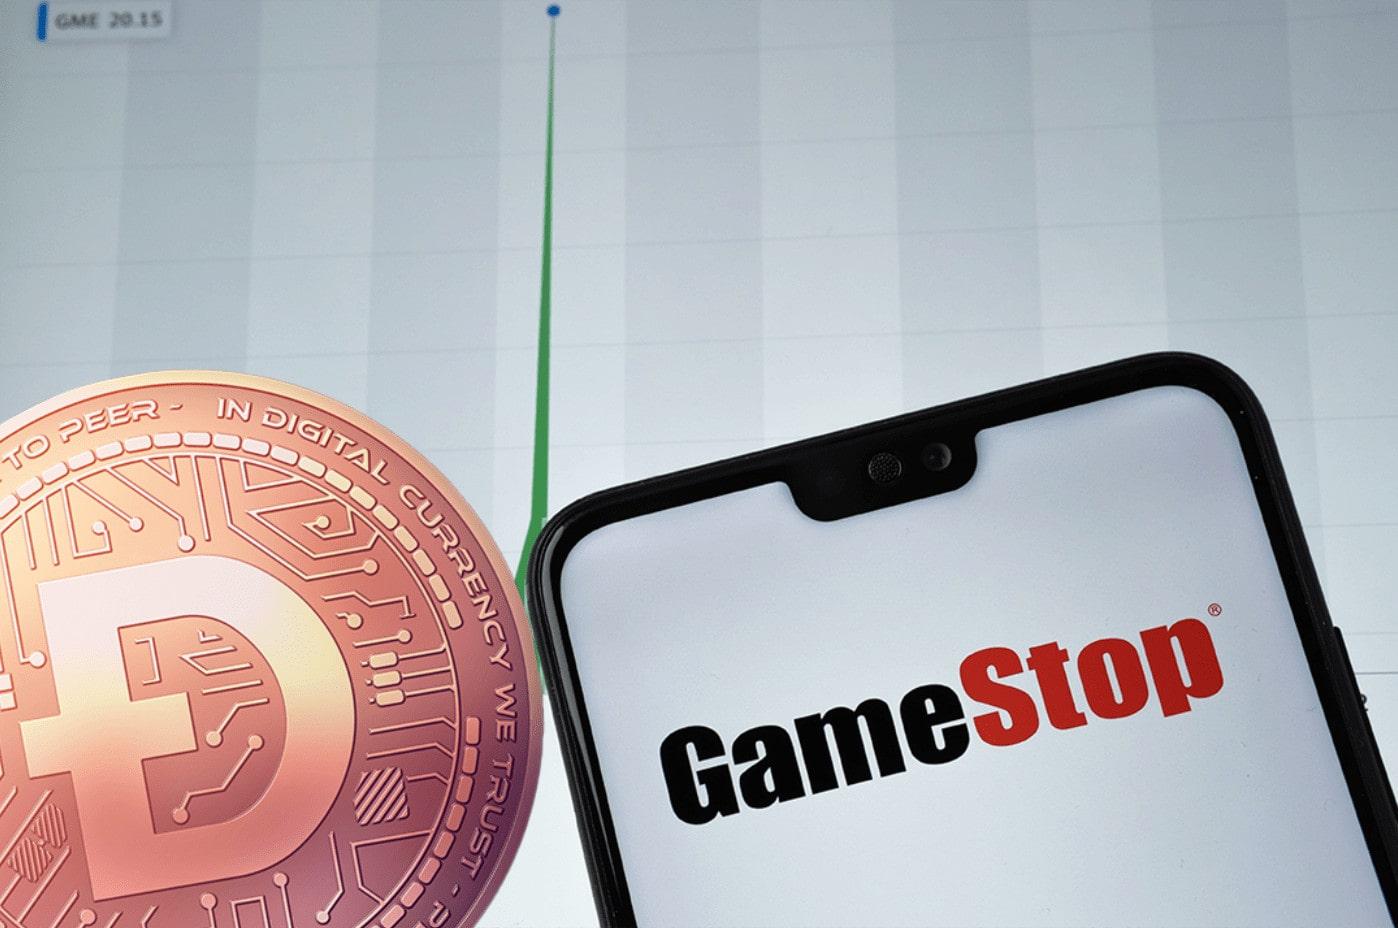 GameStop Dogecoin Lutz Auffenberg